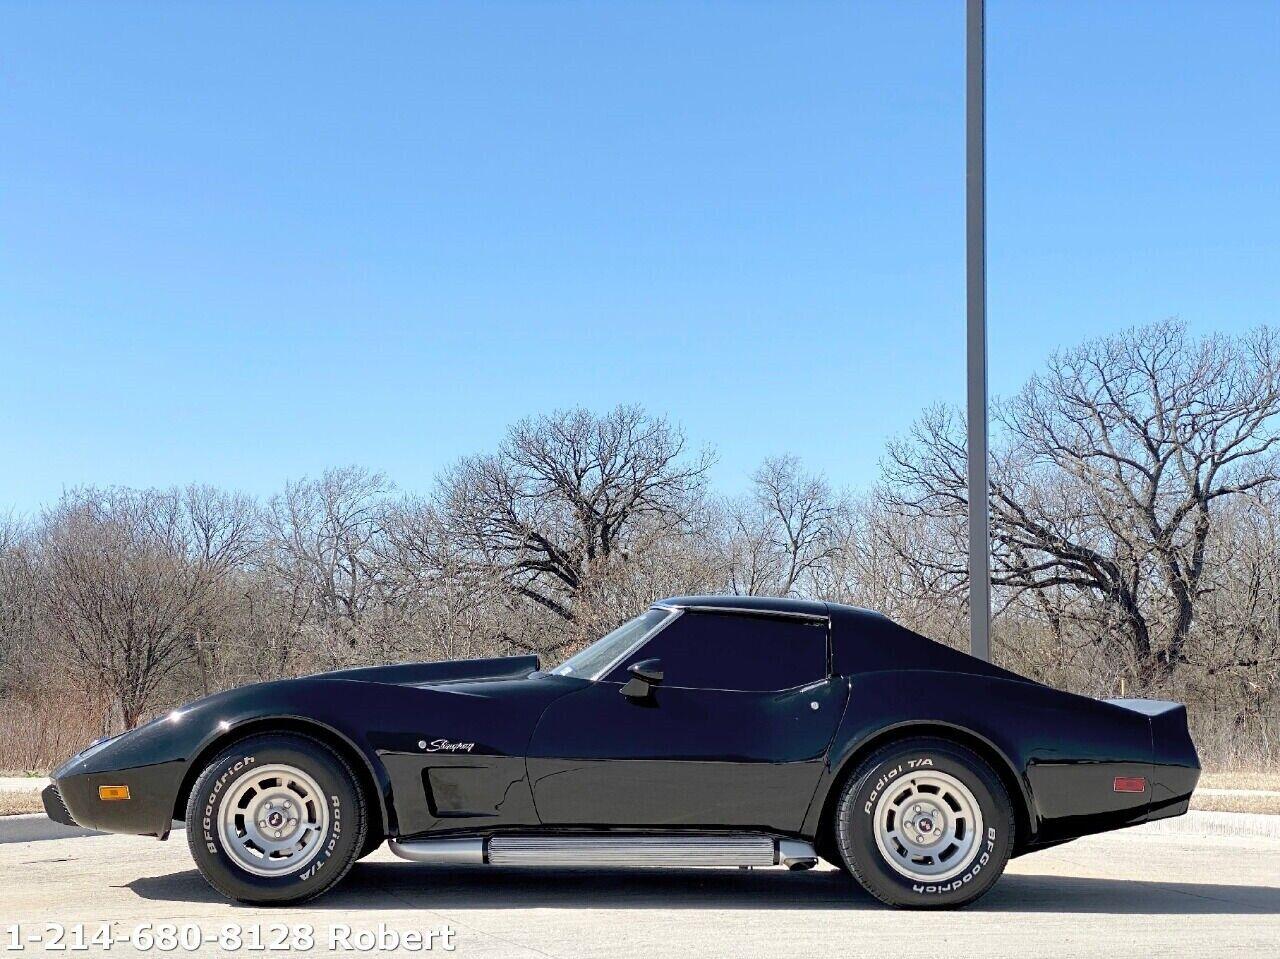 1976 Black Chevrolet Corvette Stingray  | C3 Corvette Photo 4